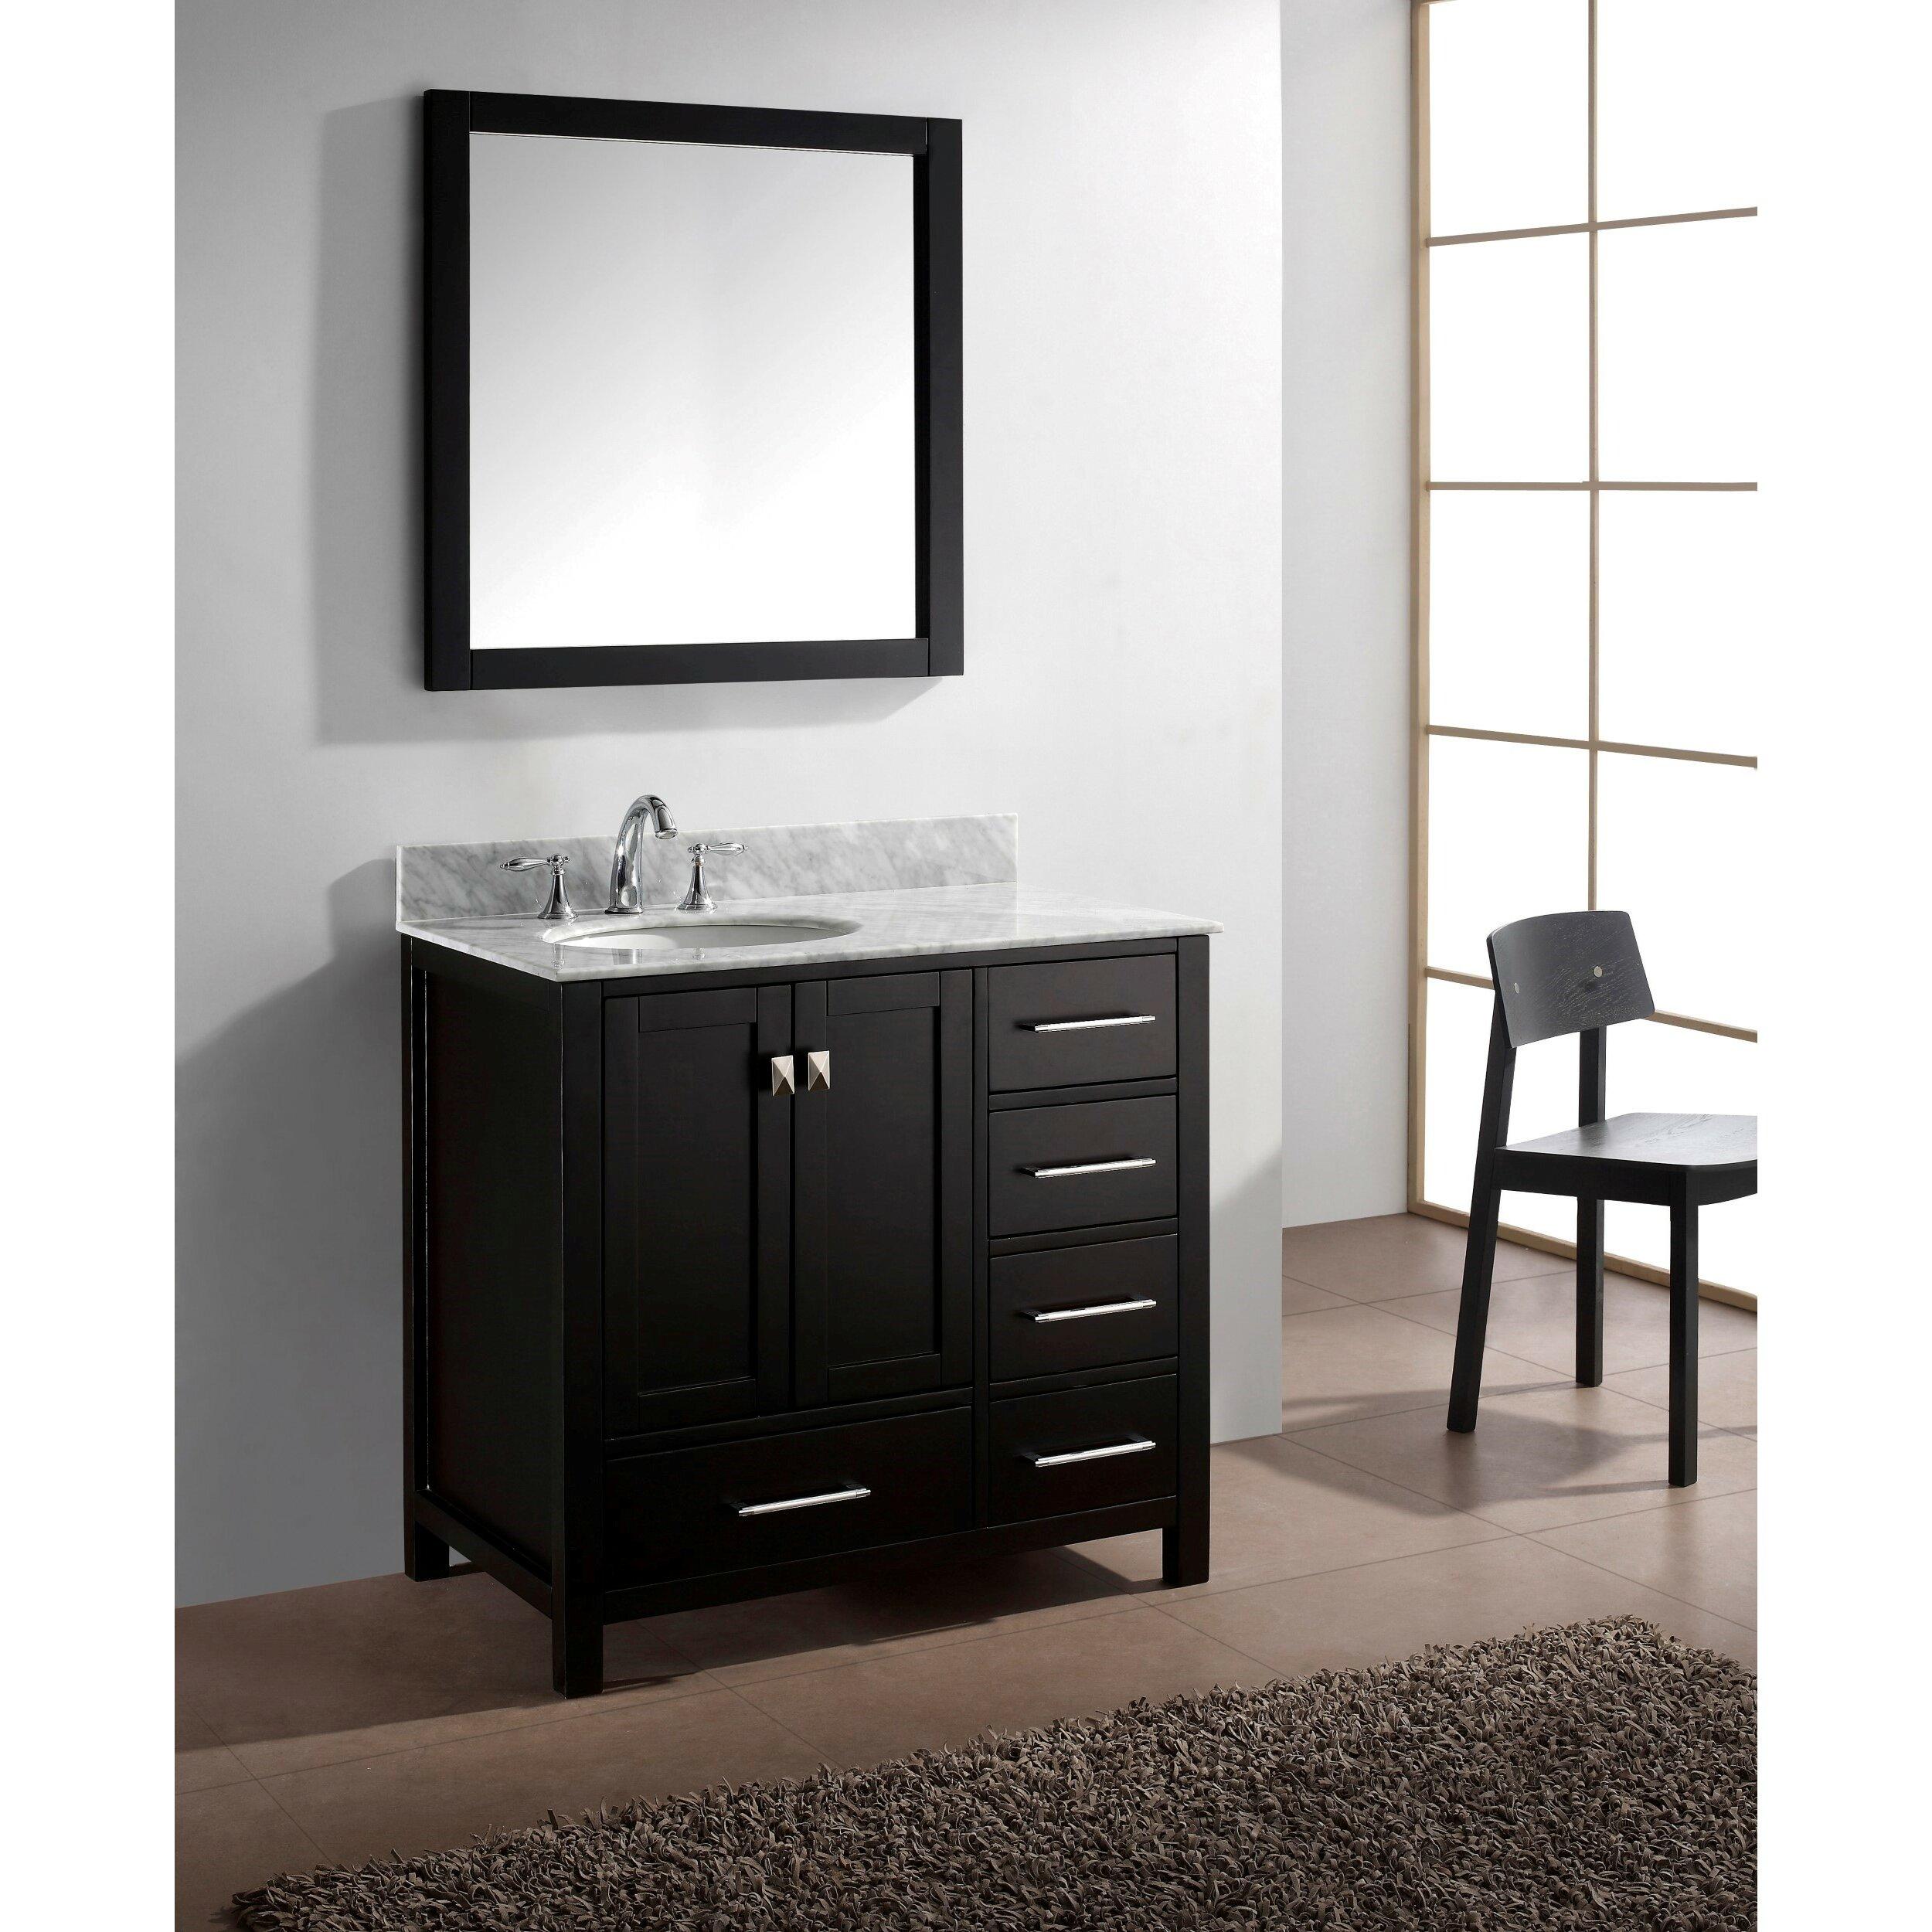 Virtu Caroline Avenue 36 8 Single Bathroom Vanity Set With Carrara White Top And Mirror